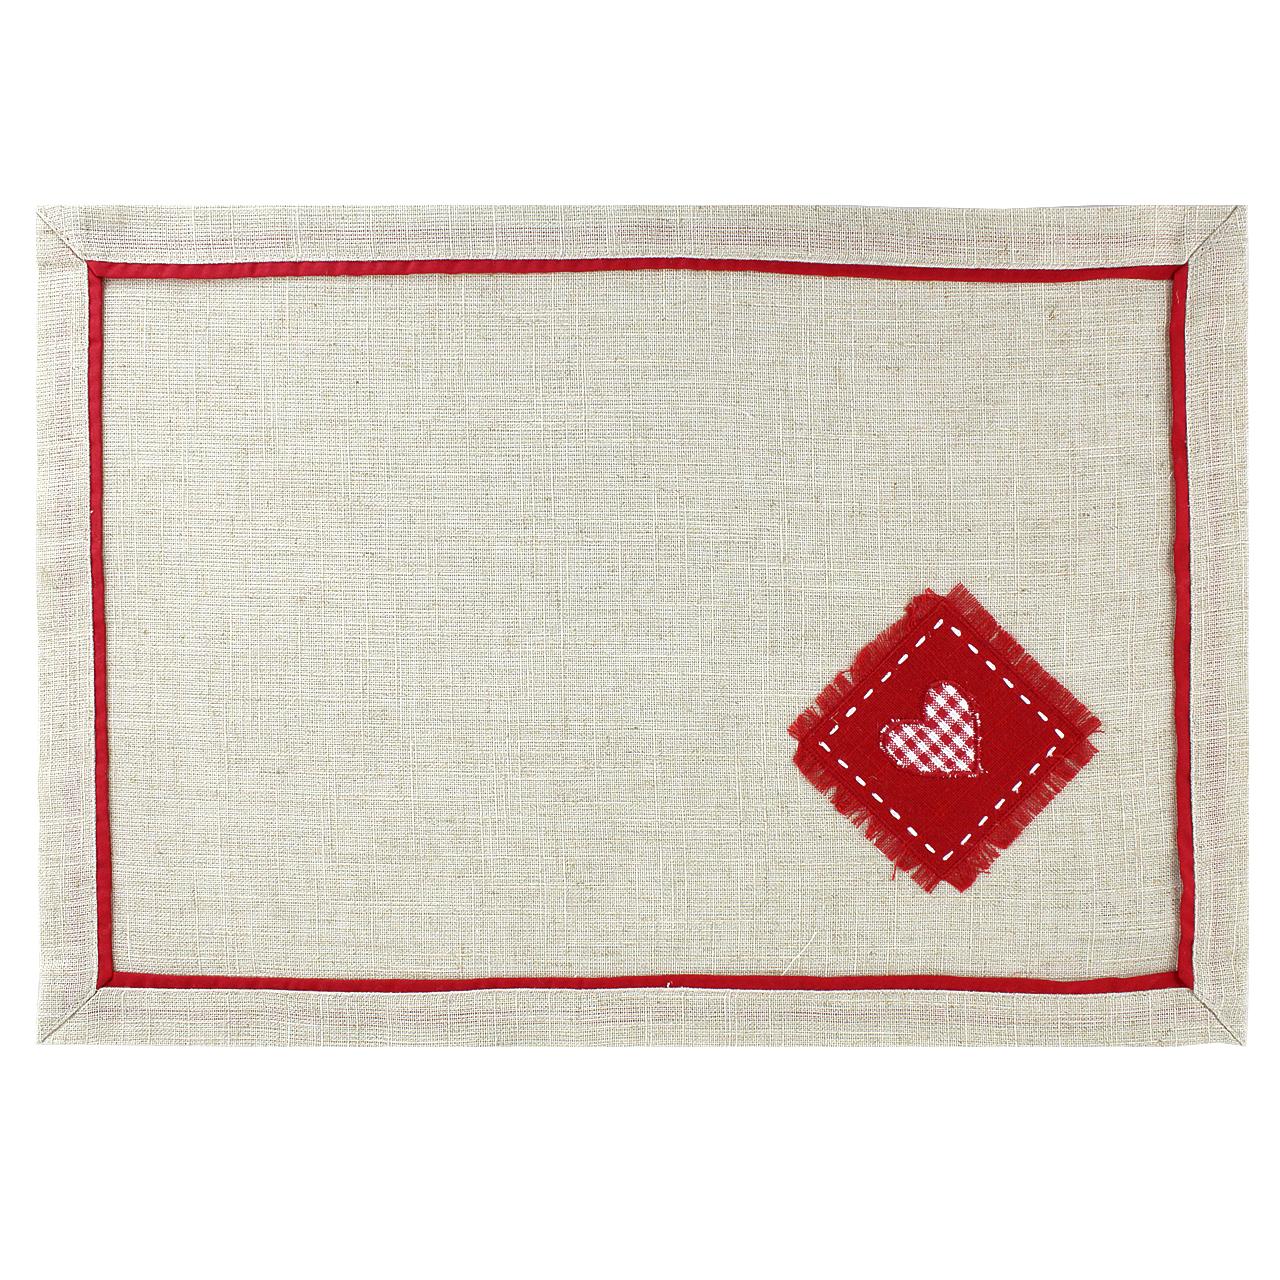 Servet De Masa Din Polyester Si In Bej Cu Inima 49x34 Cm